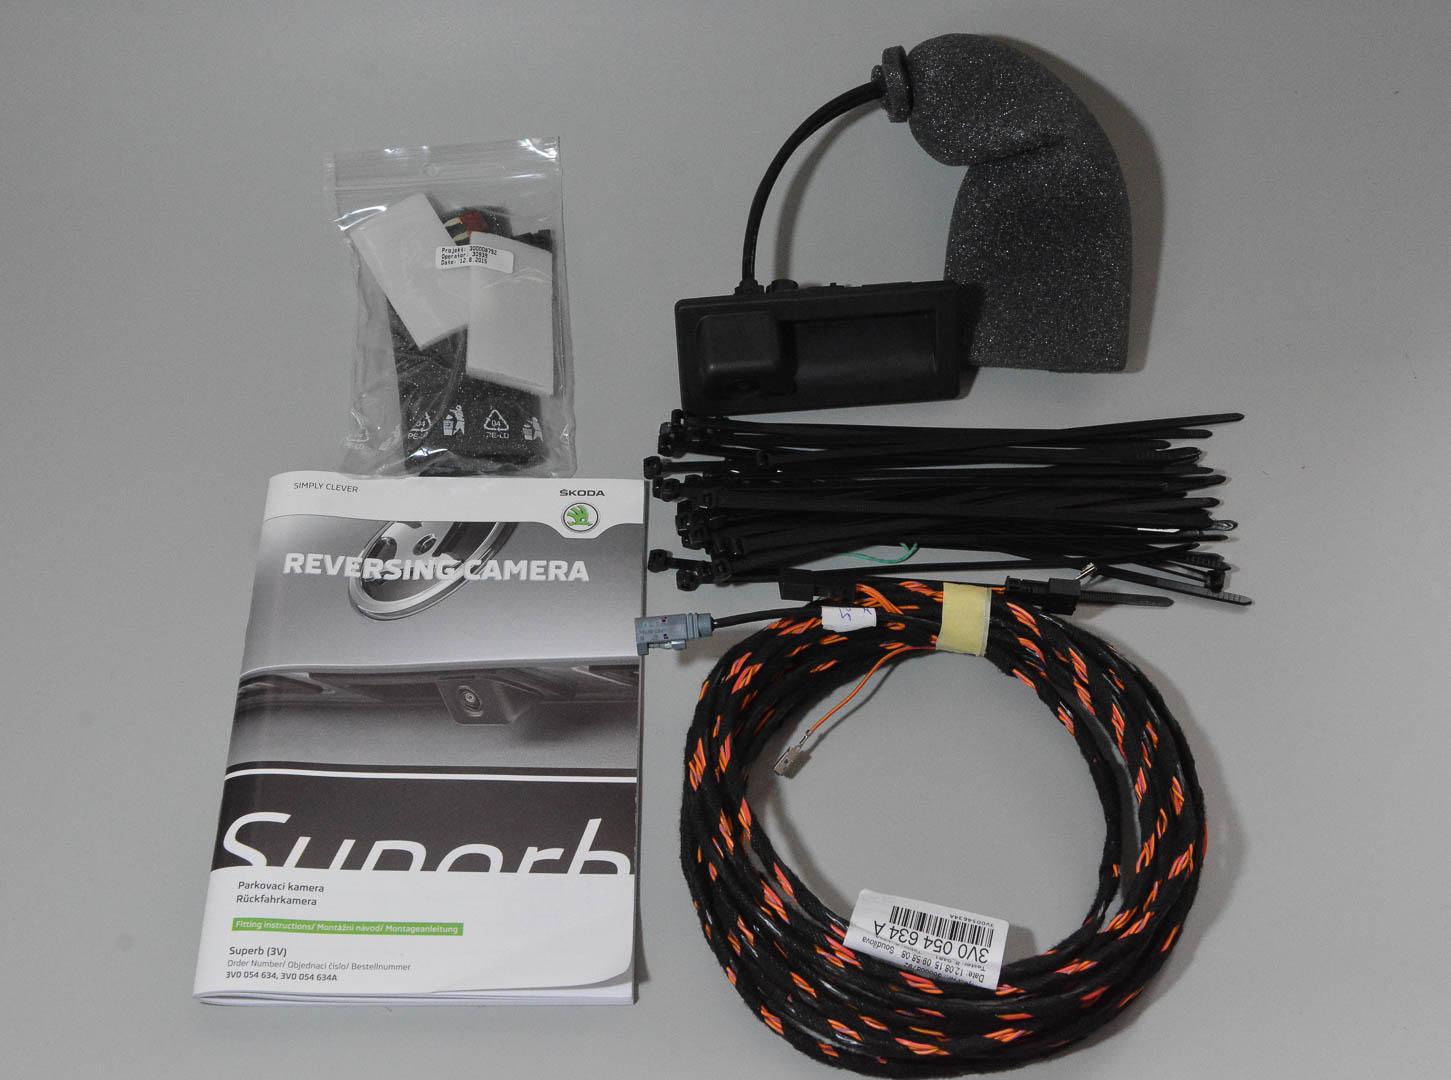 Unboxing Reversing Camera 3v0 054 634a Skoda Superb Mk Iii Wiring Harness Dsc 4536